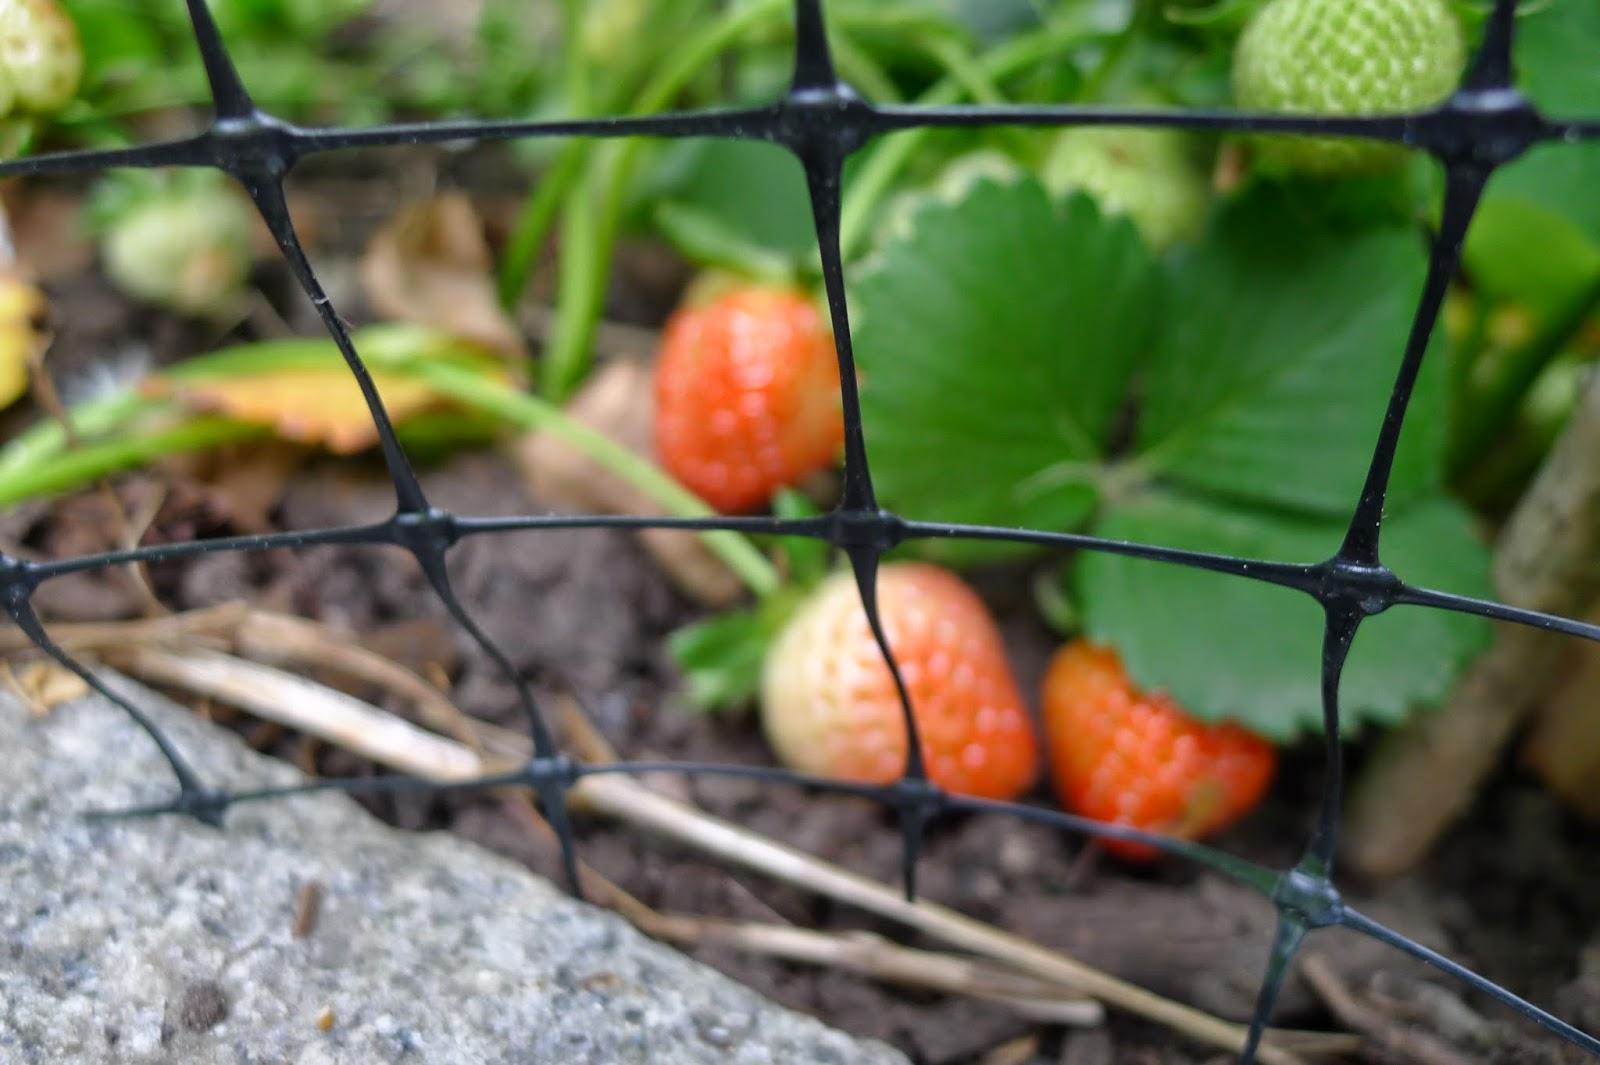 Netting over strawberries, organic pest control, urban farming